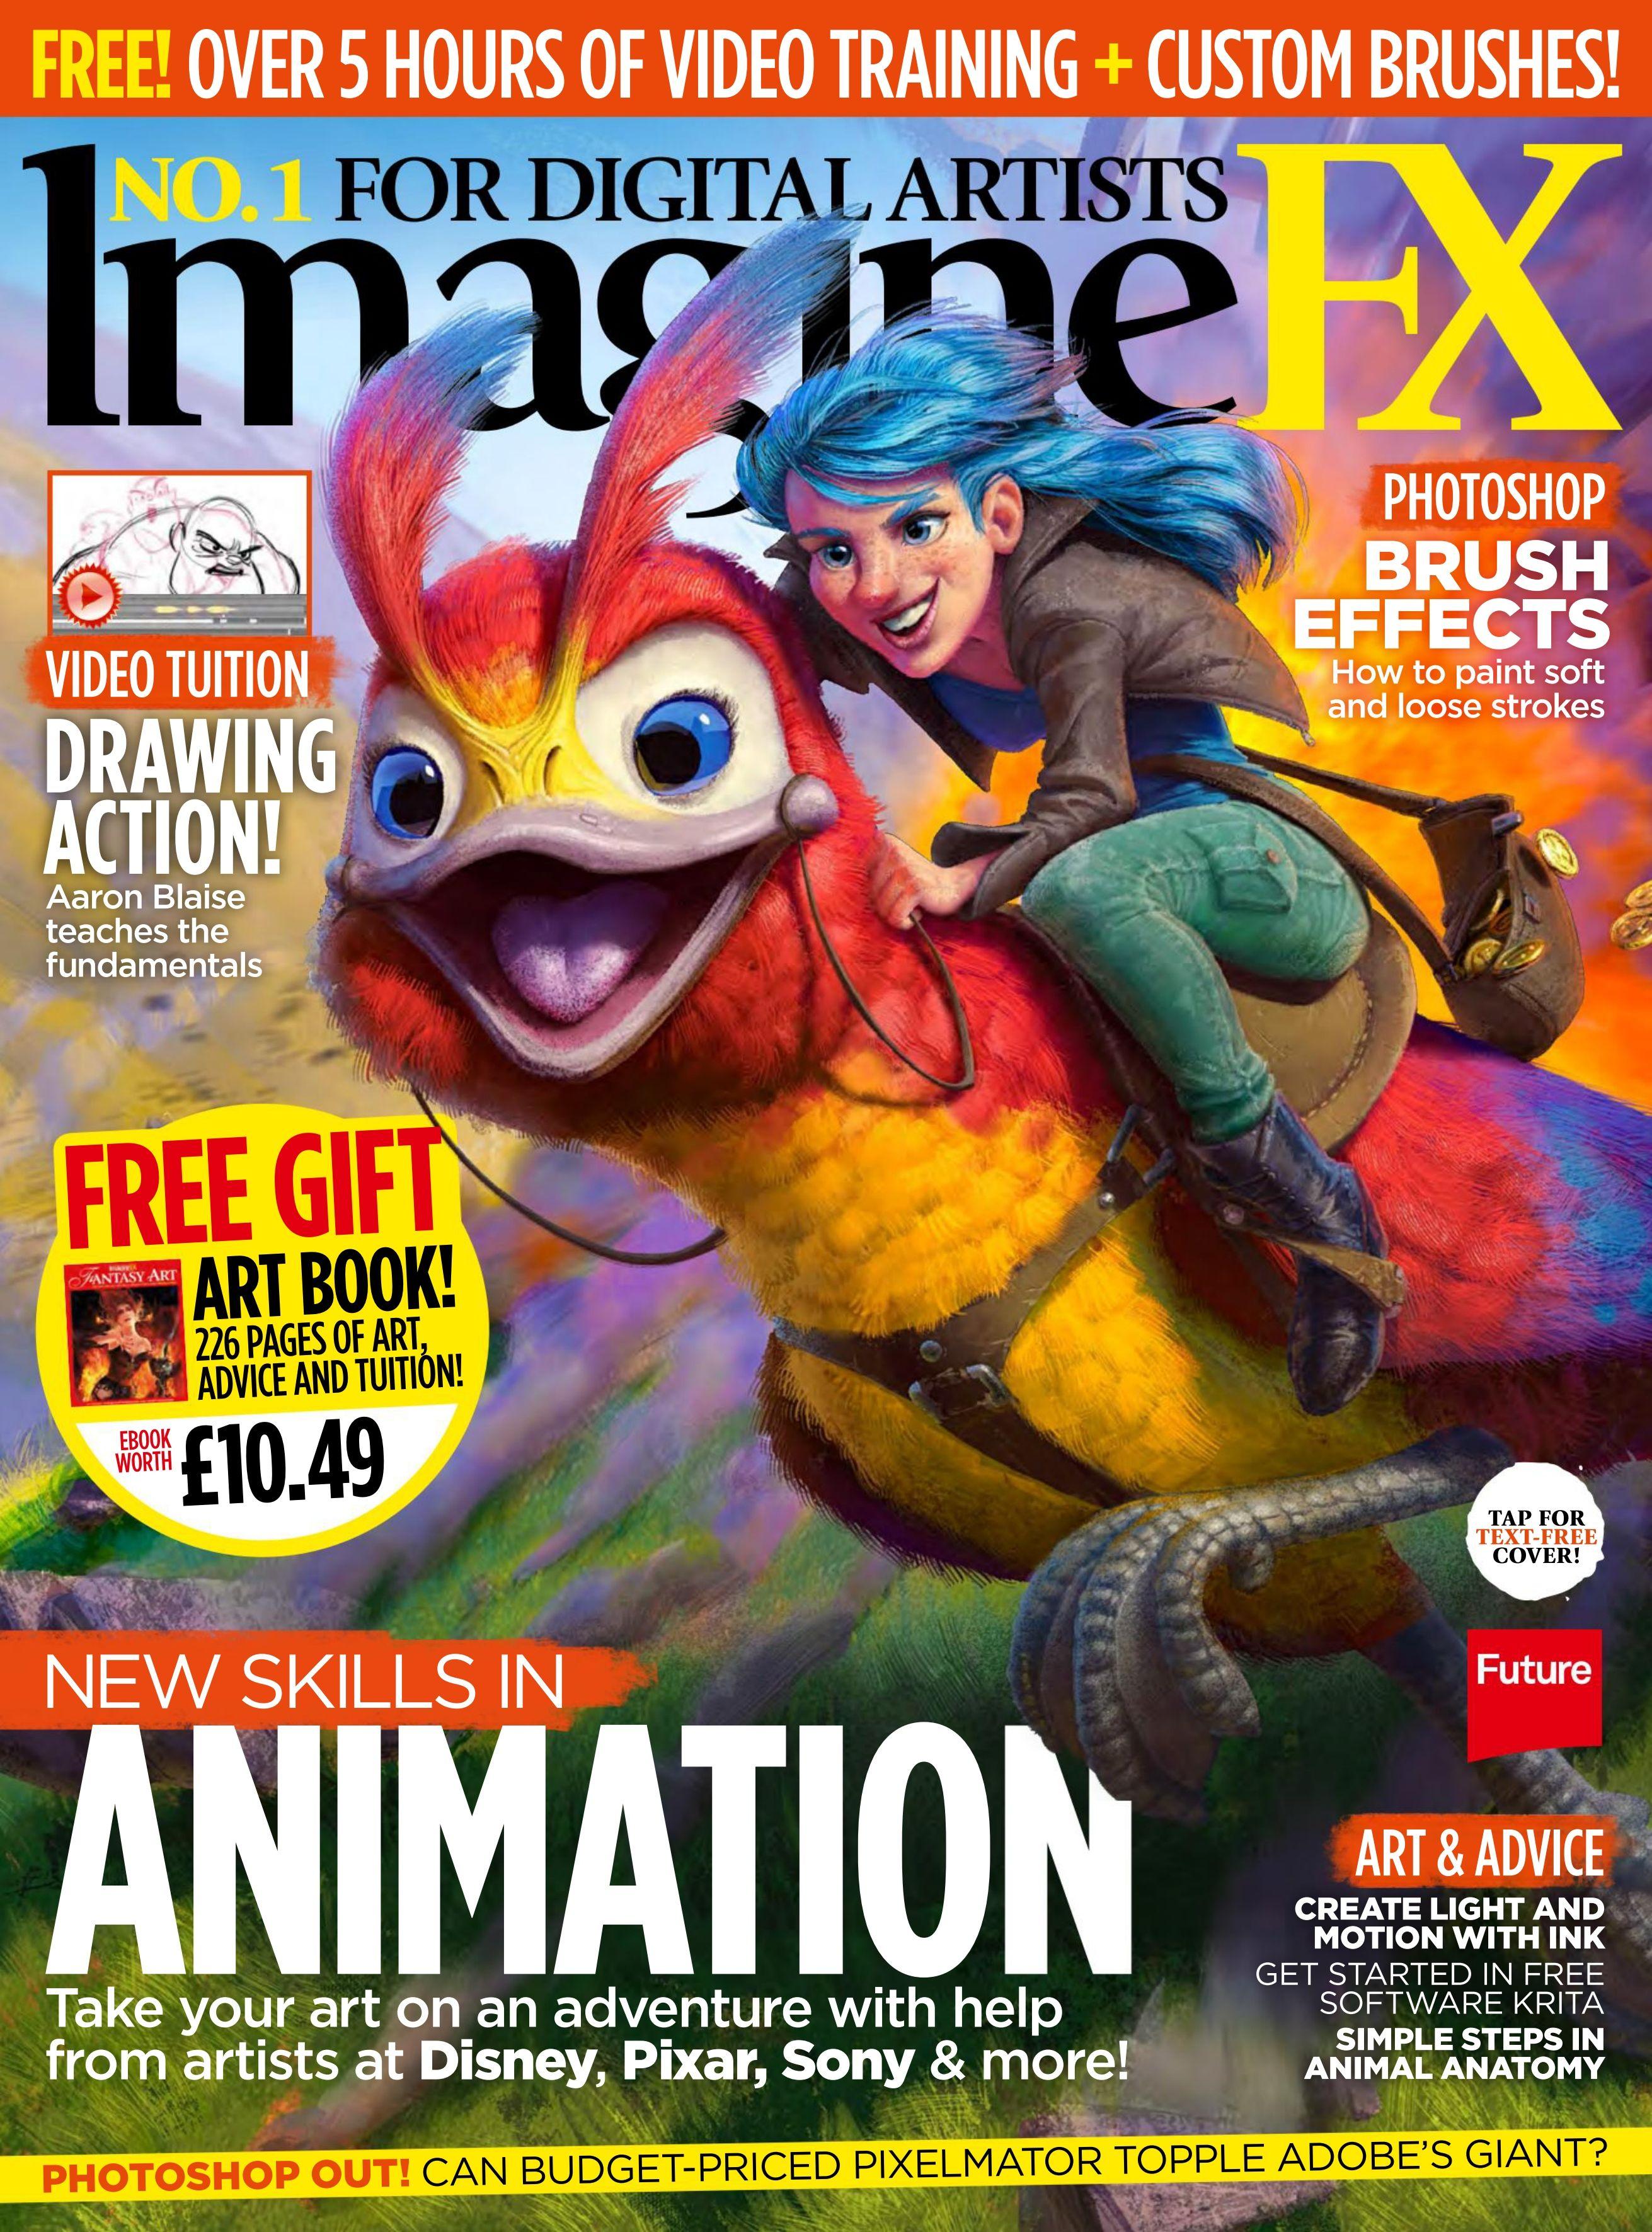 IMAGINEFX 2012 07 DOWNLOAD